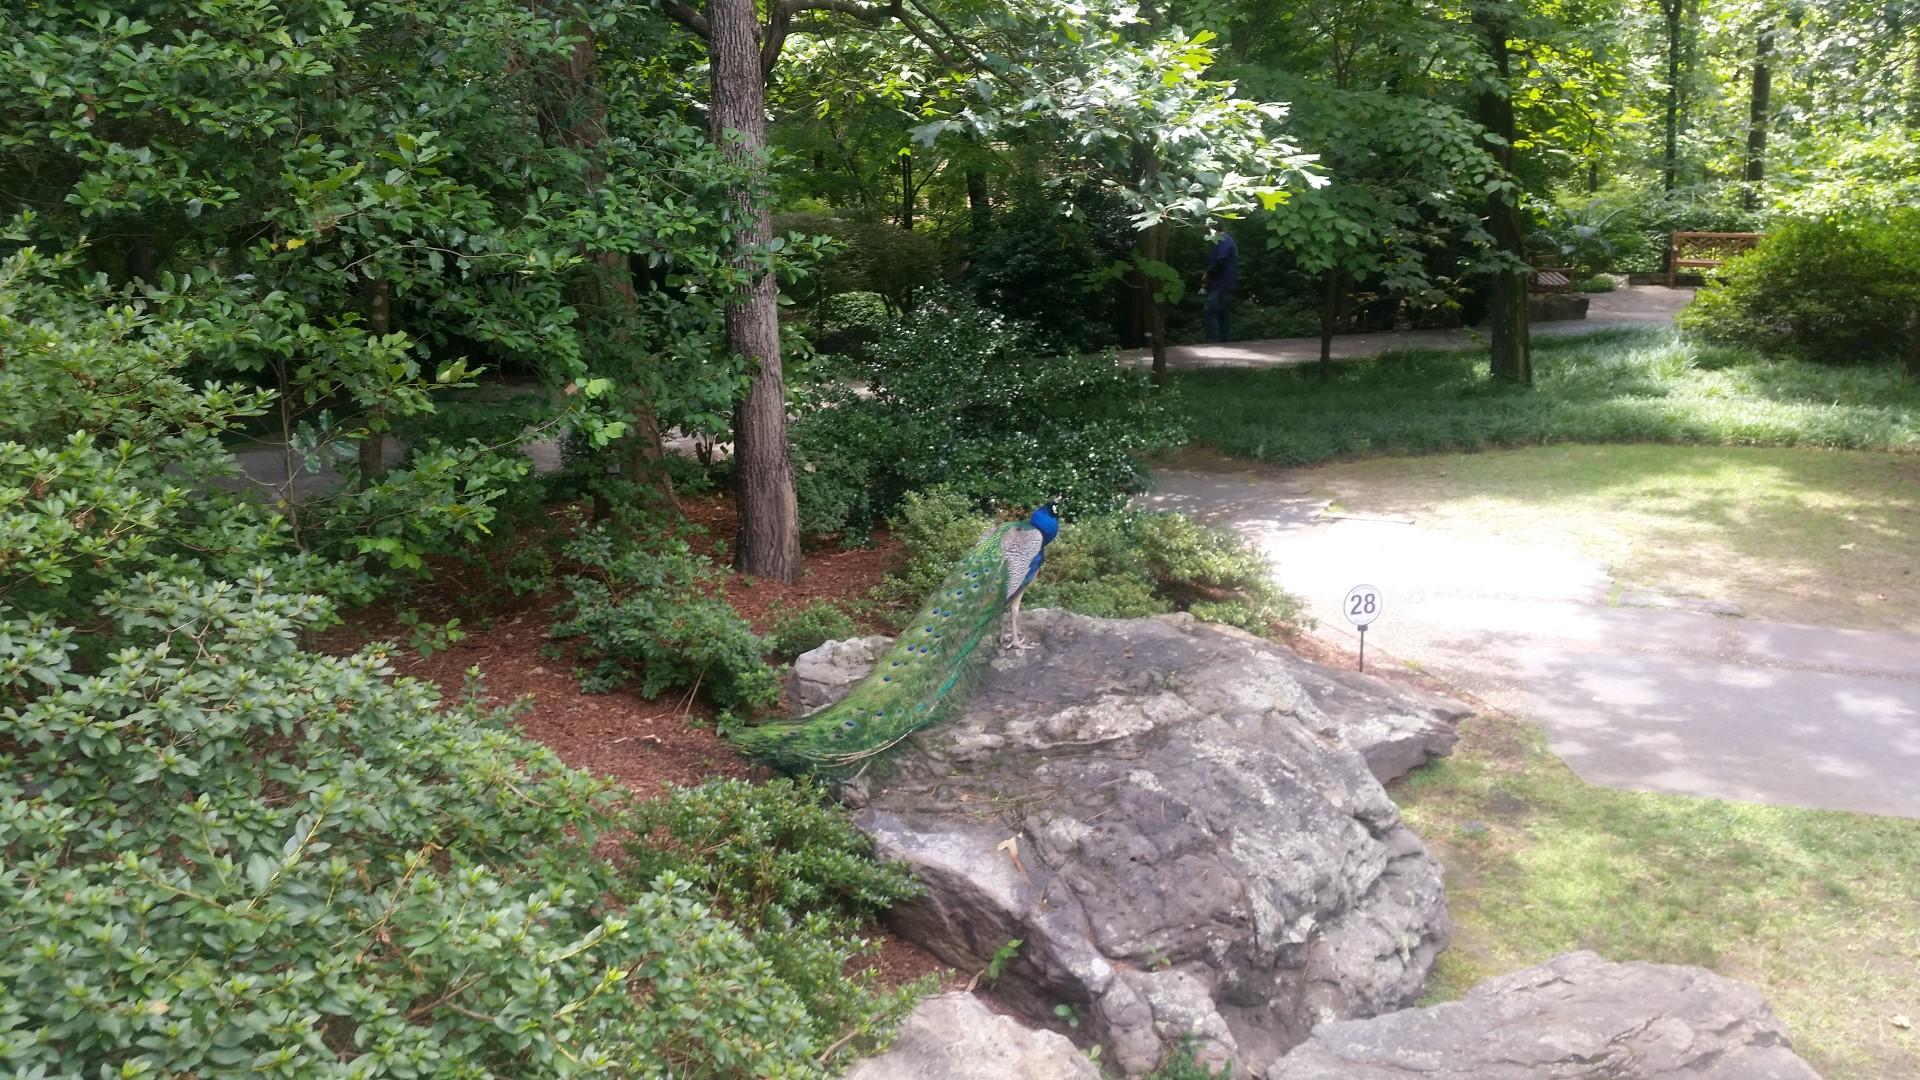 Garvan Woodland Gardens In Hot Springs Arkansas Dora And The Explorers